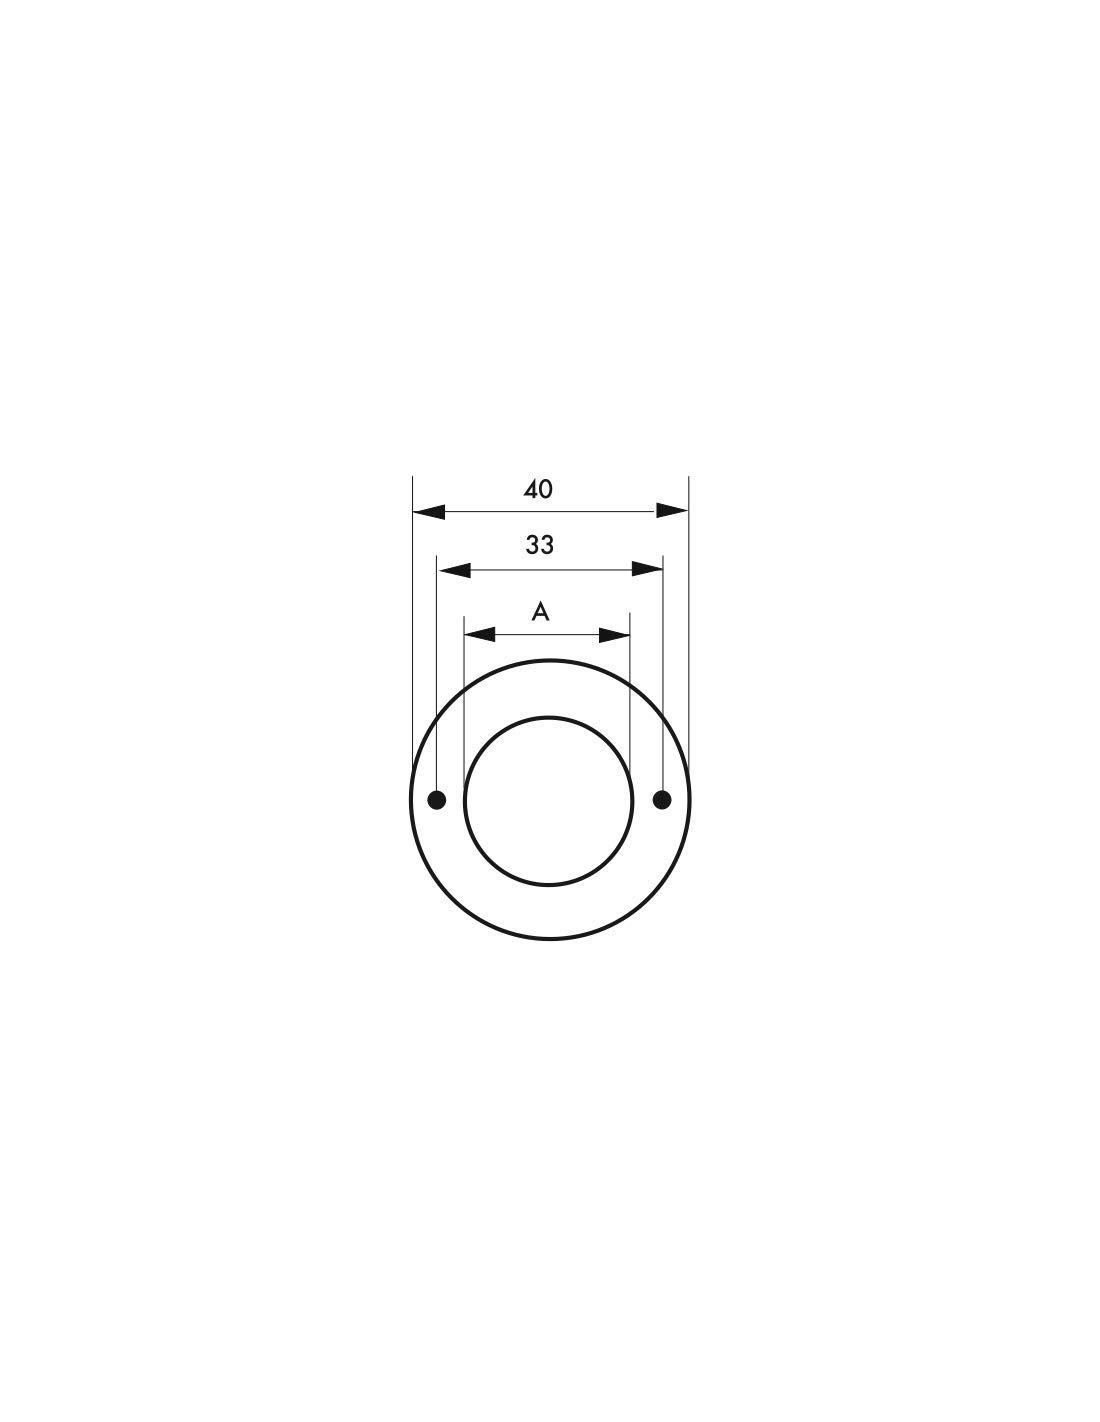 Thirard - Rosace laiton diamè tre 24 mm